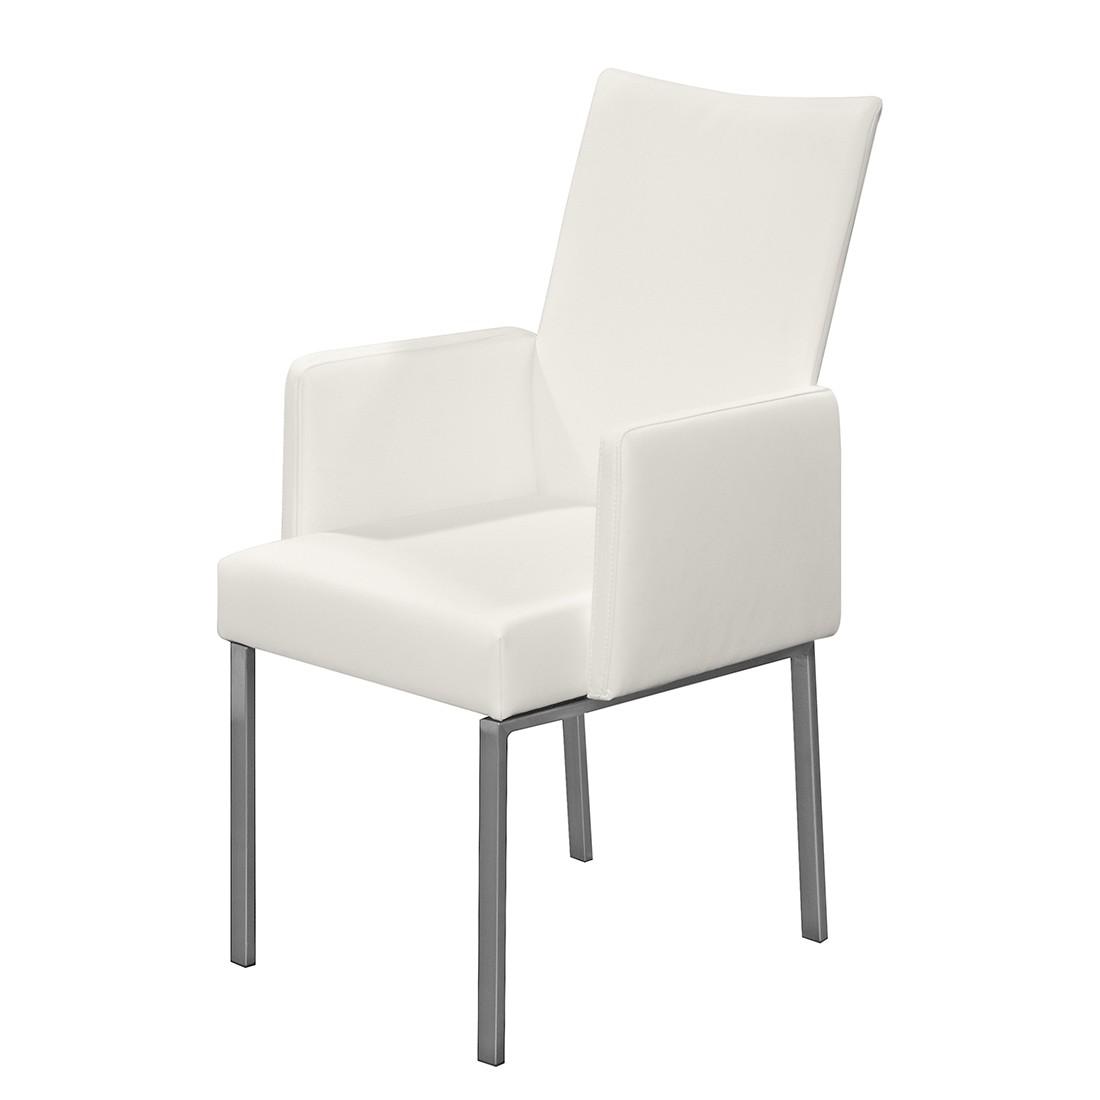 Armlehnenstuhl Set – Echtleder Weiß, Arte M günstig